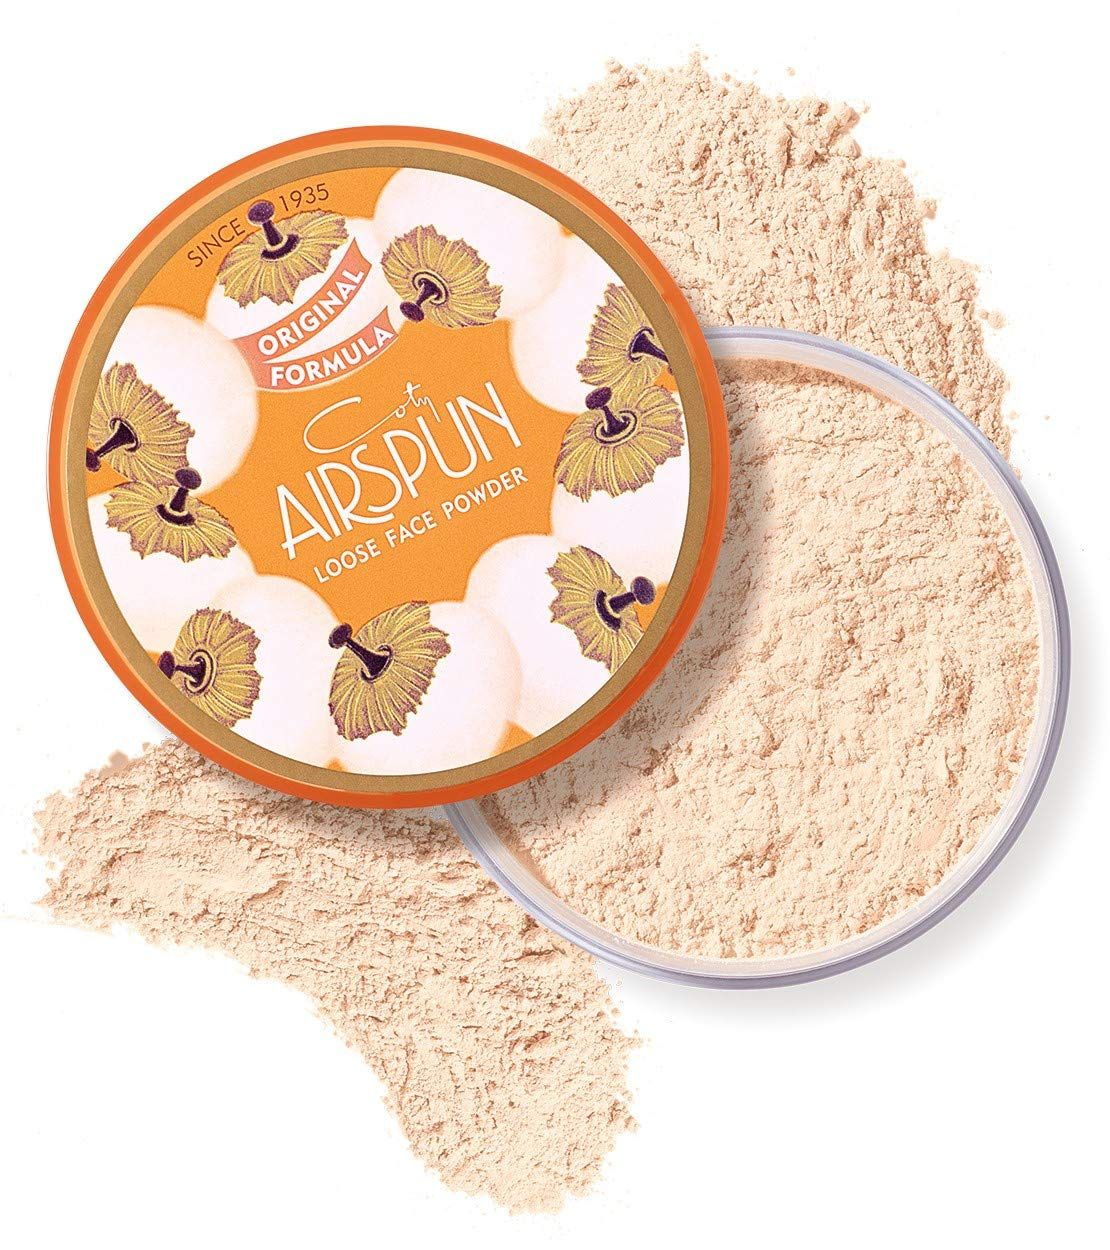 Coty airspun face powder naturally neutral